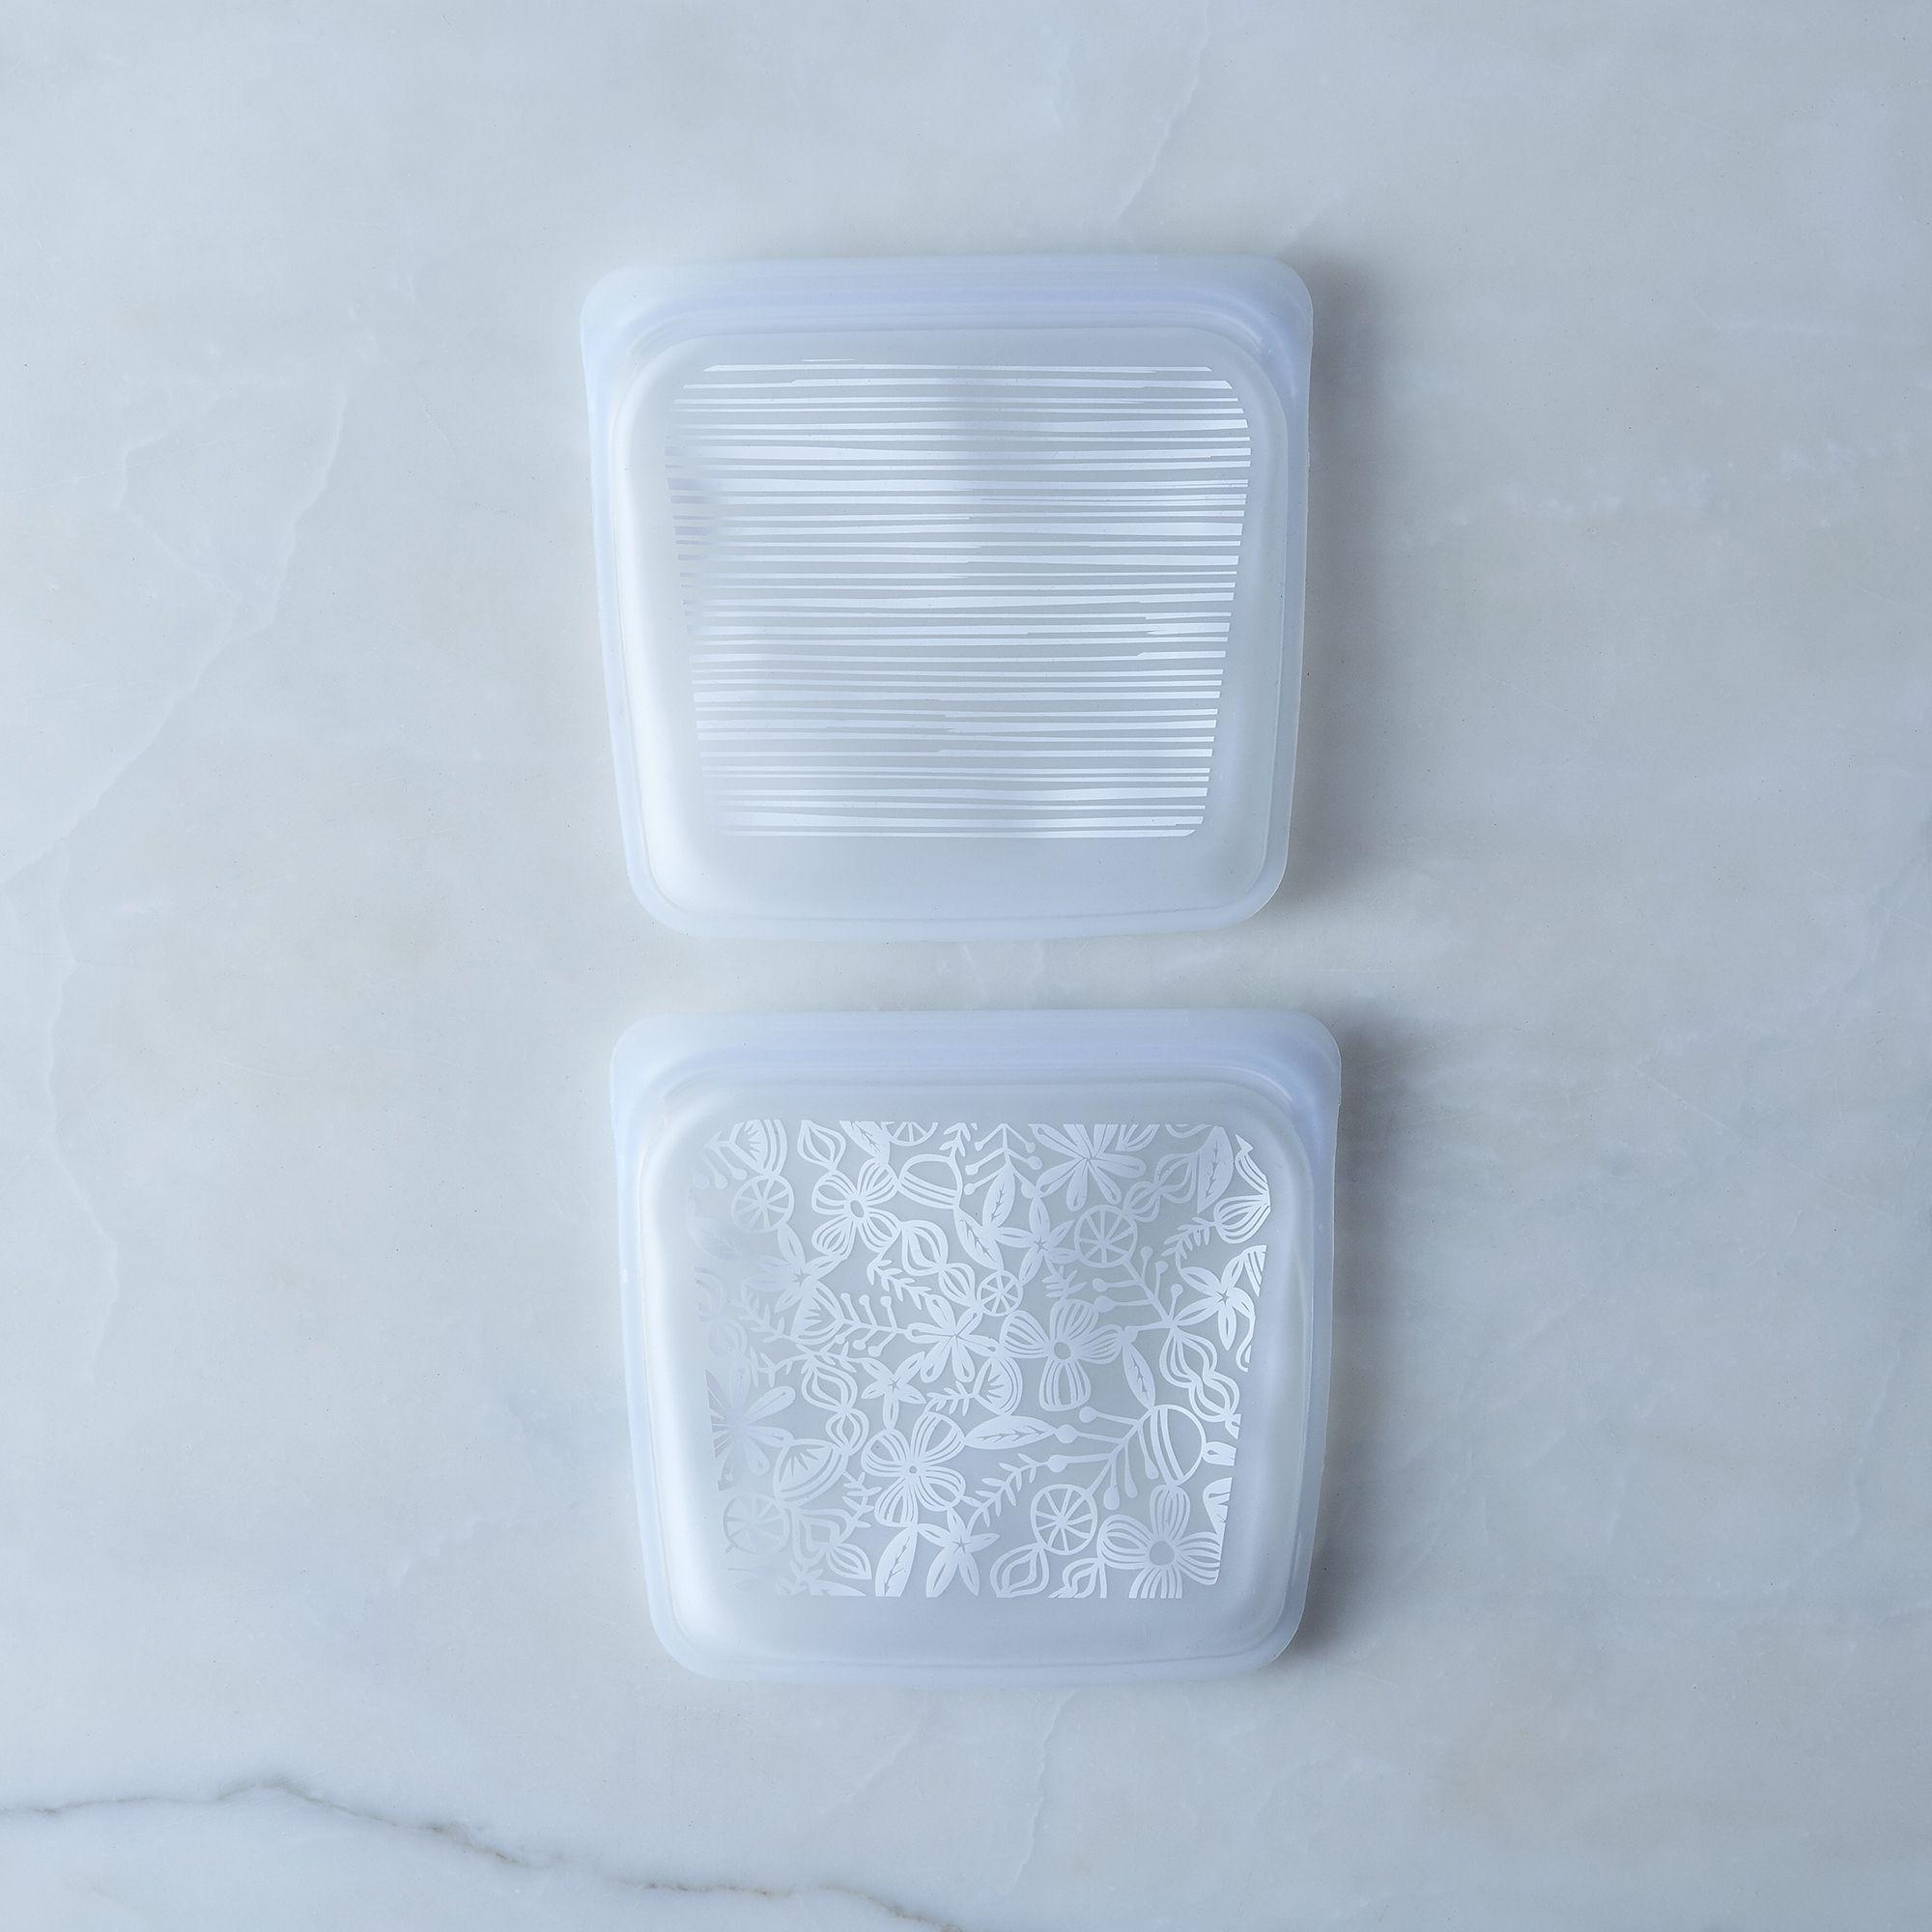 57bc5e08 66d5 46df 9f1b 0960bdccf49a  2017 0516 stasher reusable sandwich storage bags regular pattern pack set of 2 detail silo rocky luten 011